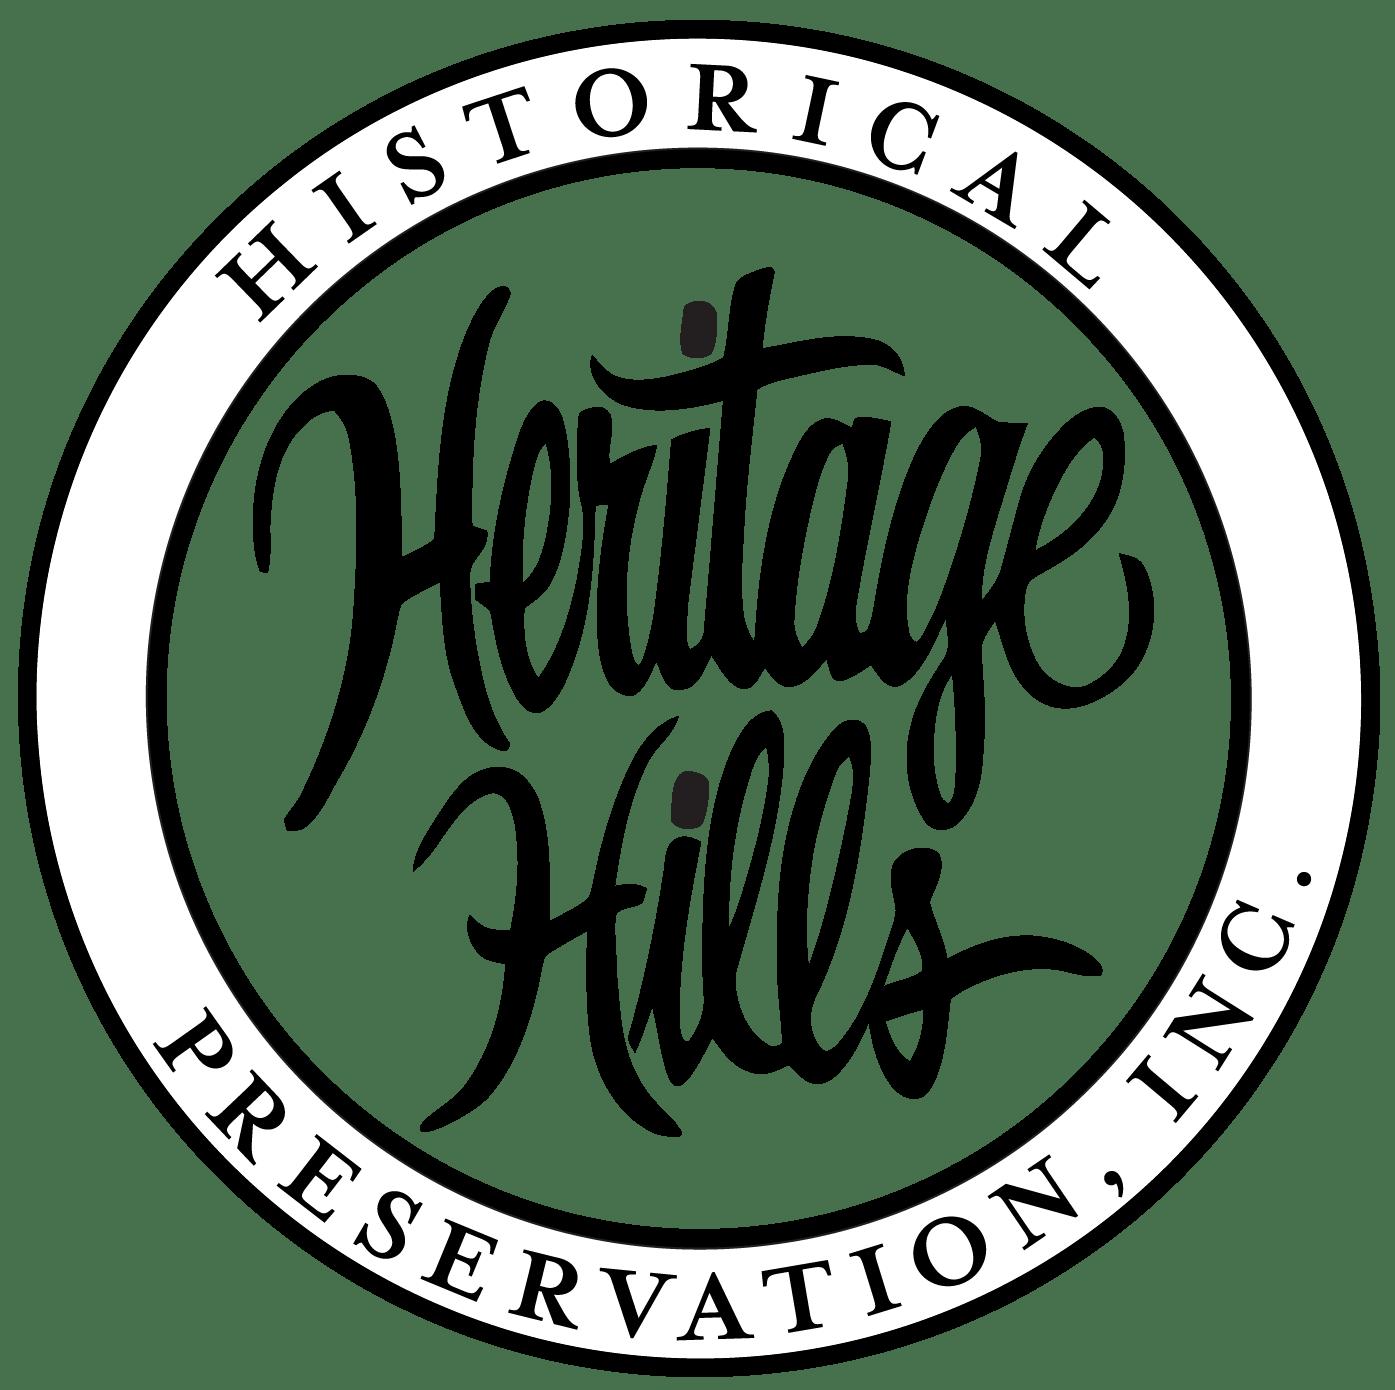 Historical Preservation, Inc.